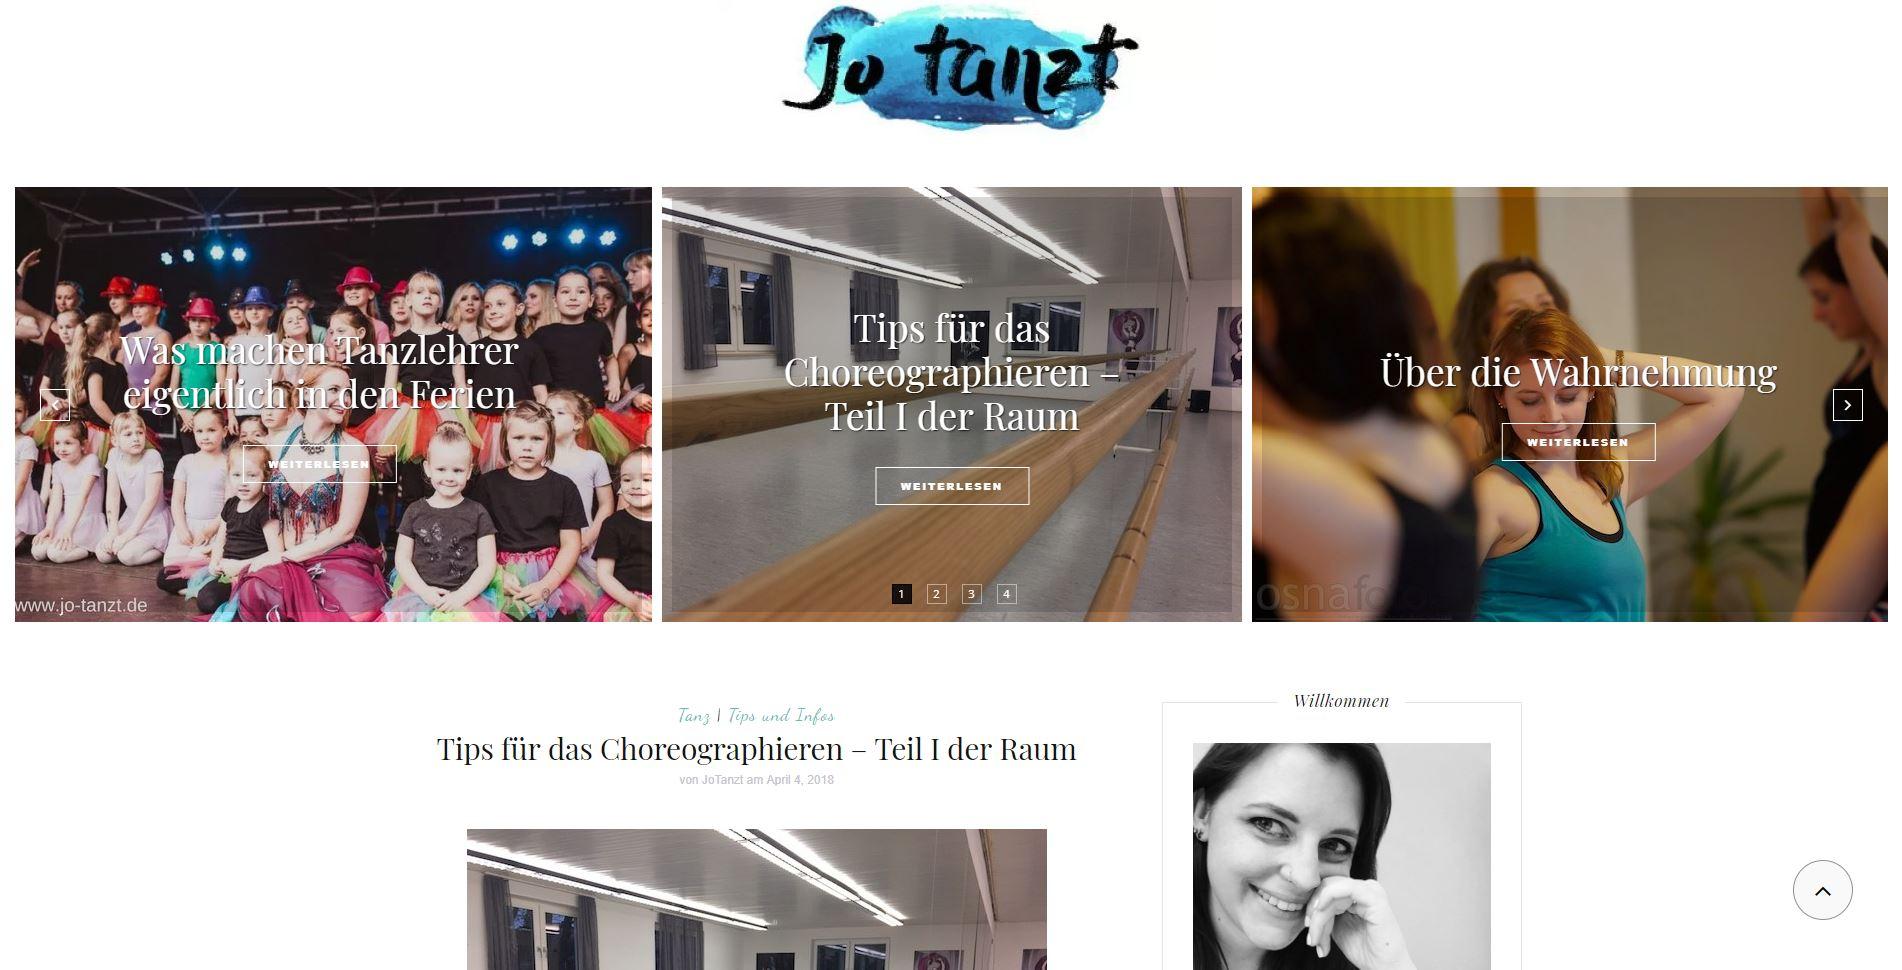 Screenshot Blog Jo tanzt